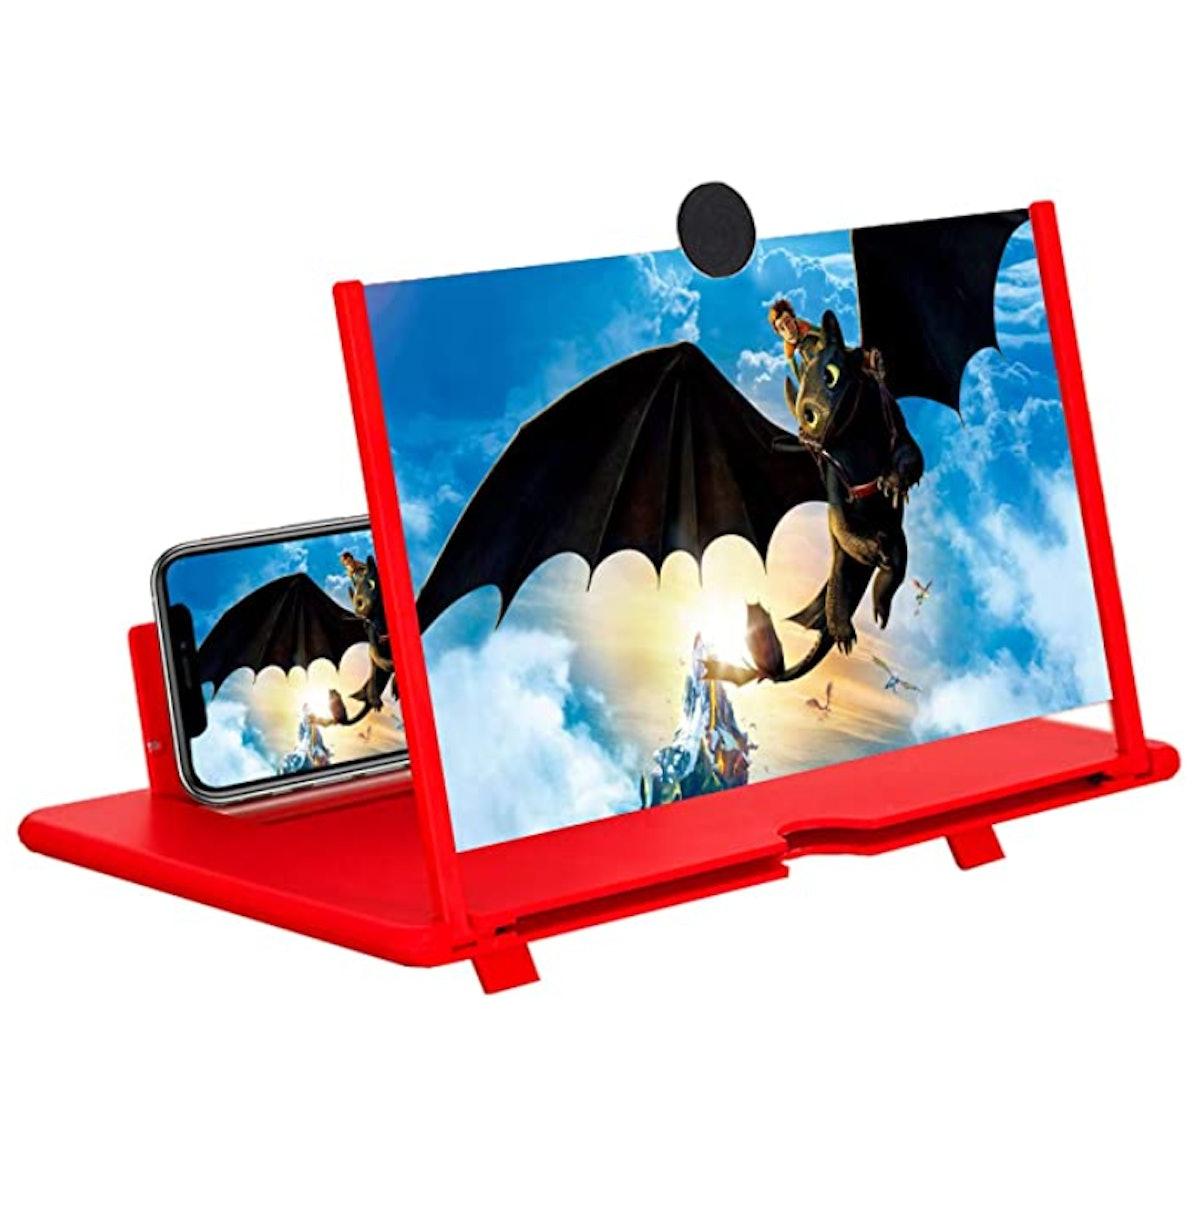 Fanlory Screen Magnifier